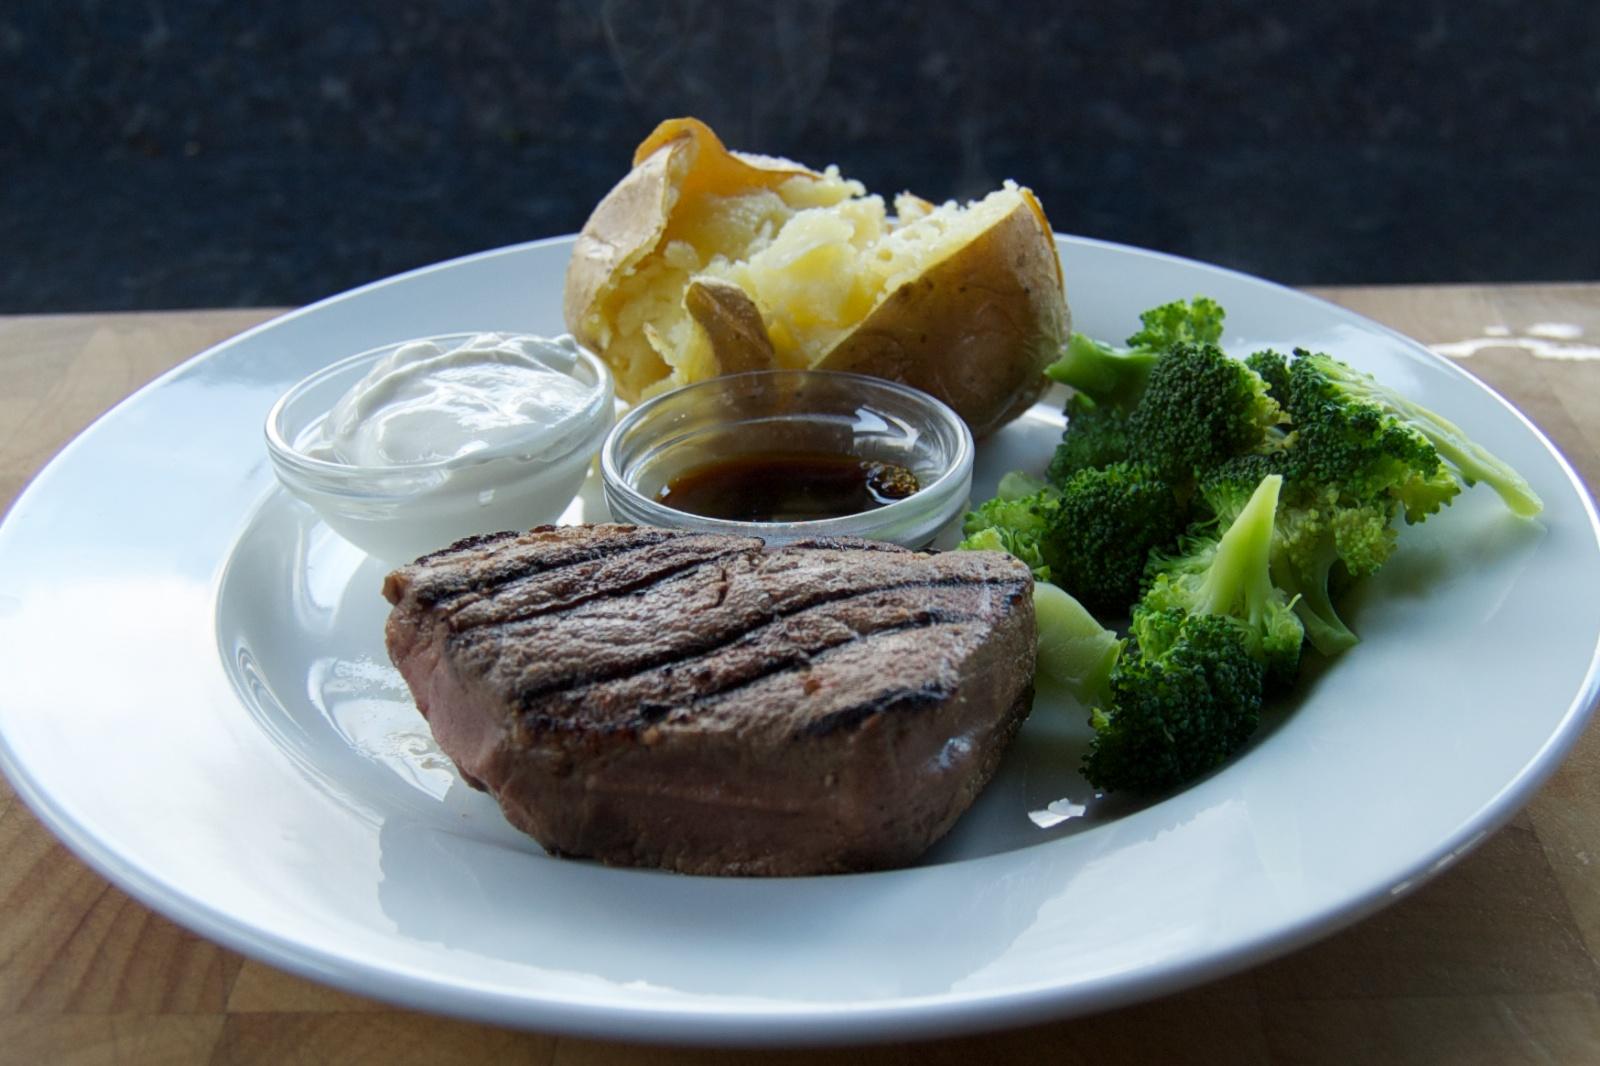 http://blog.rickk.com/food/2012/02/04/ate.2012.02.04.d.jpg